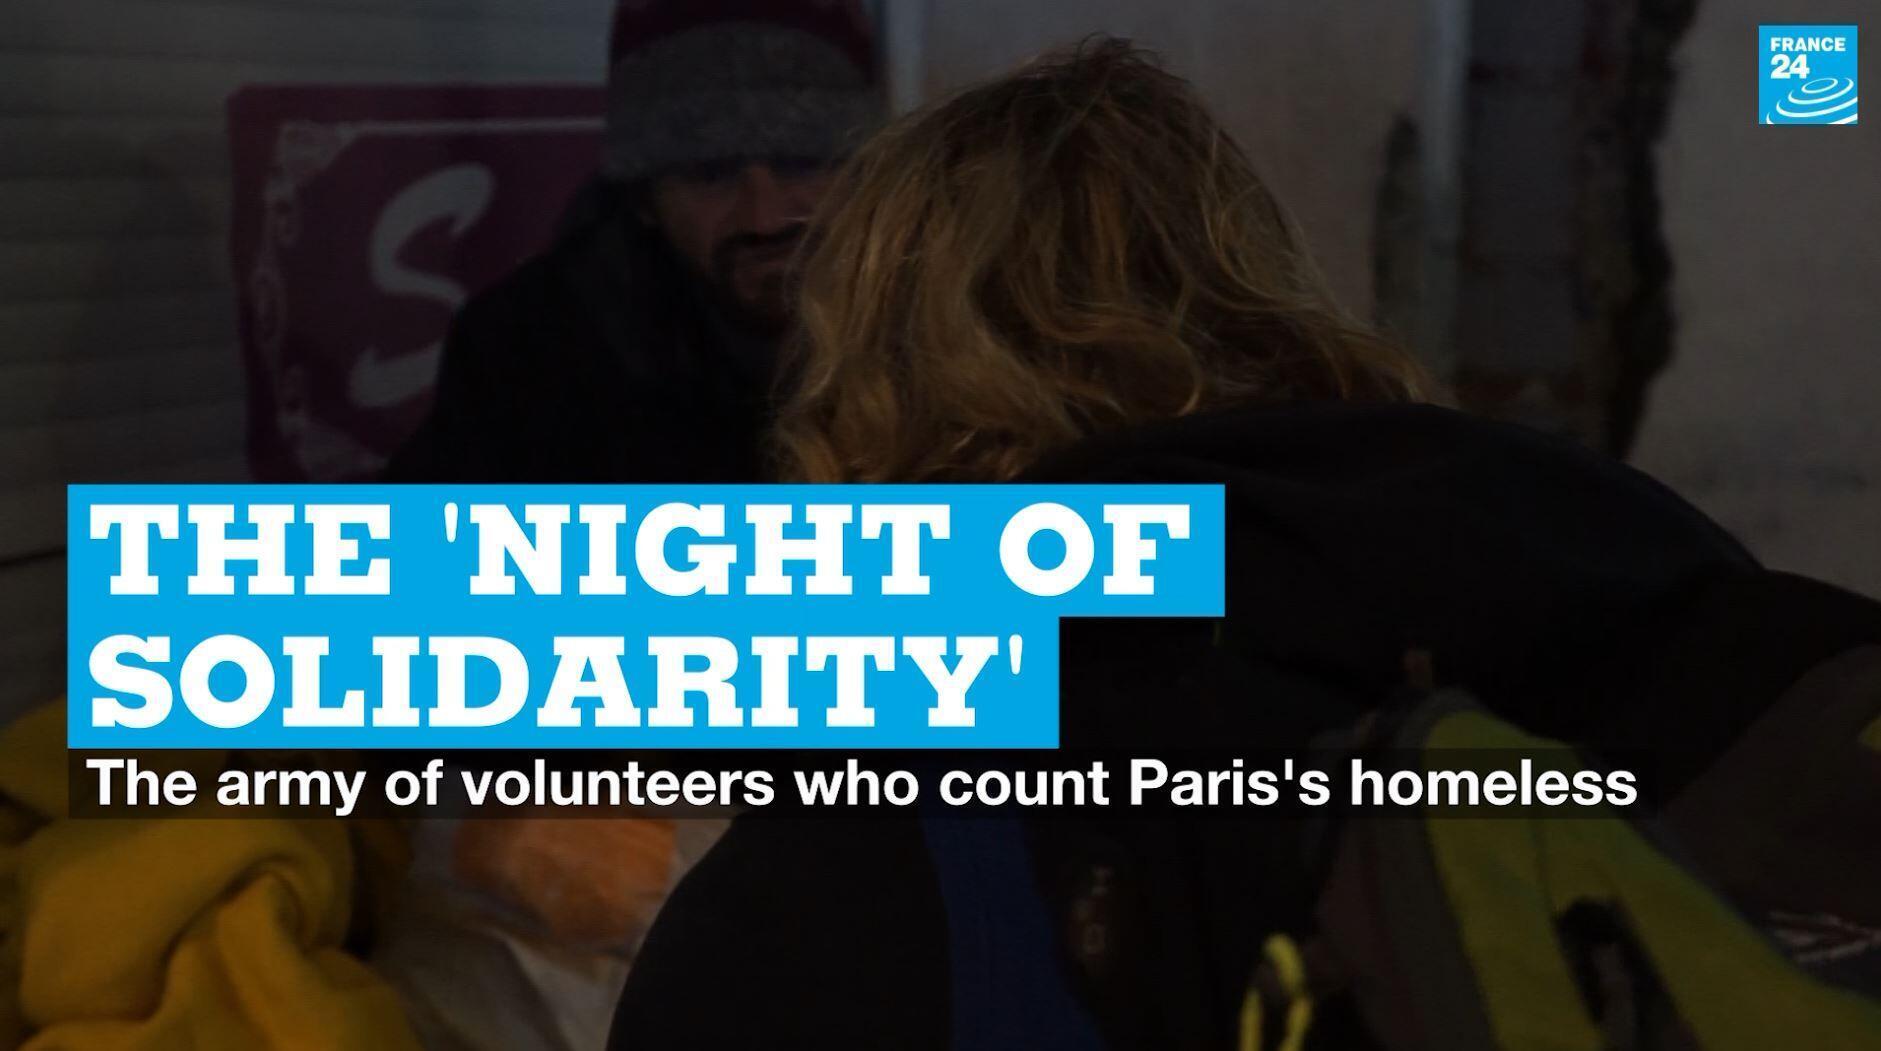 Volunteers take part in the Night of Solidarity in Paris on January 30, 2020.